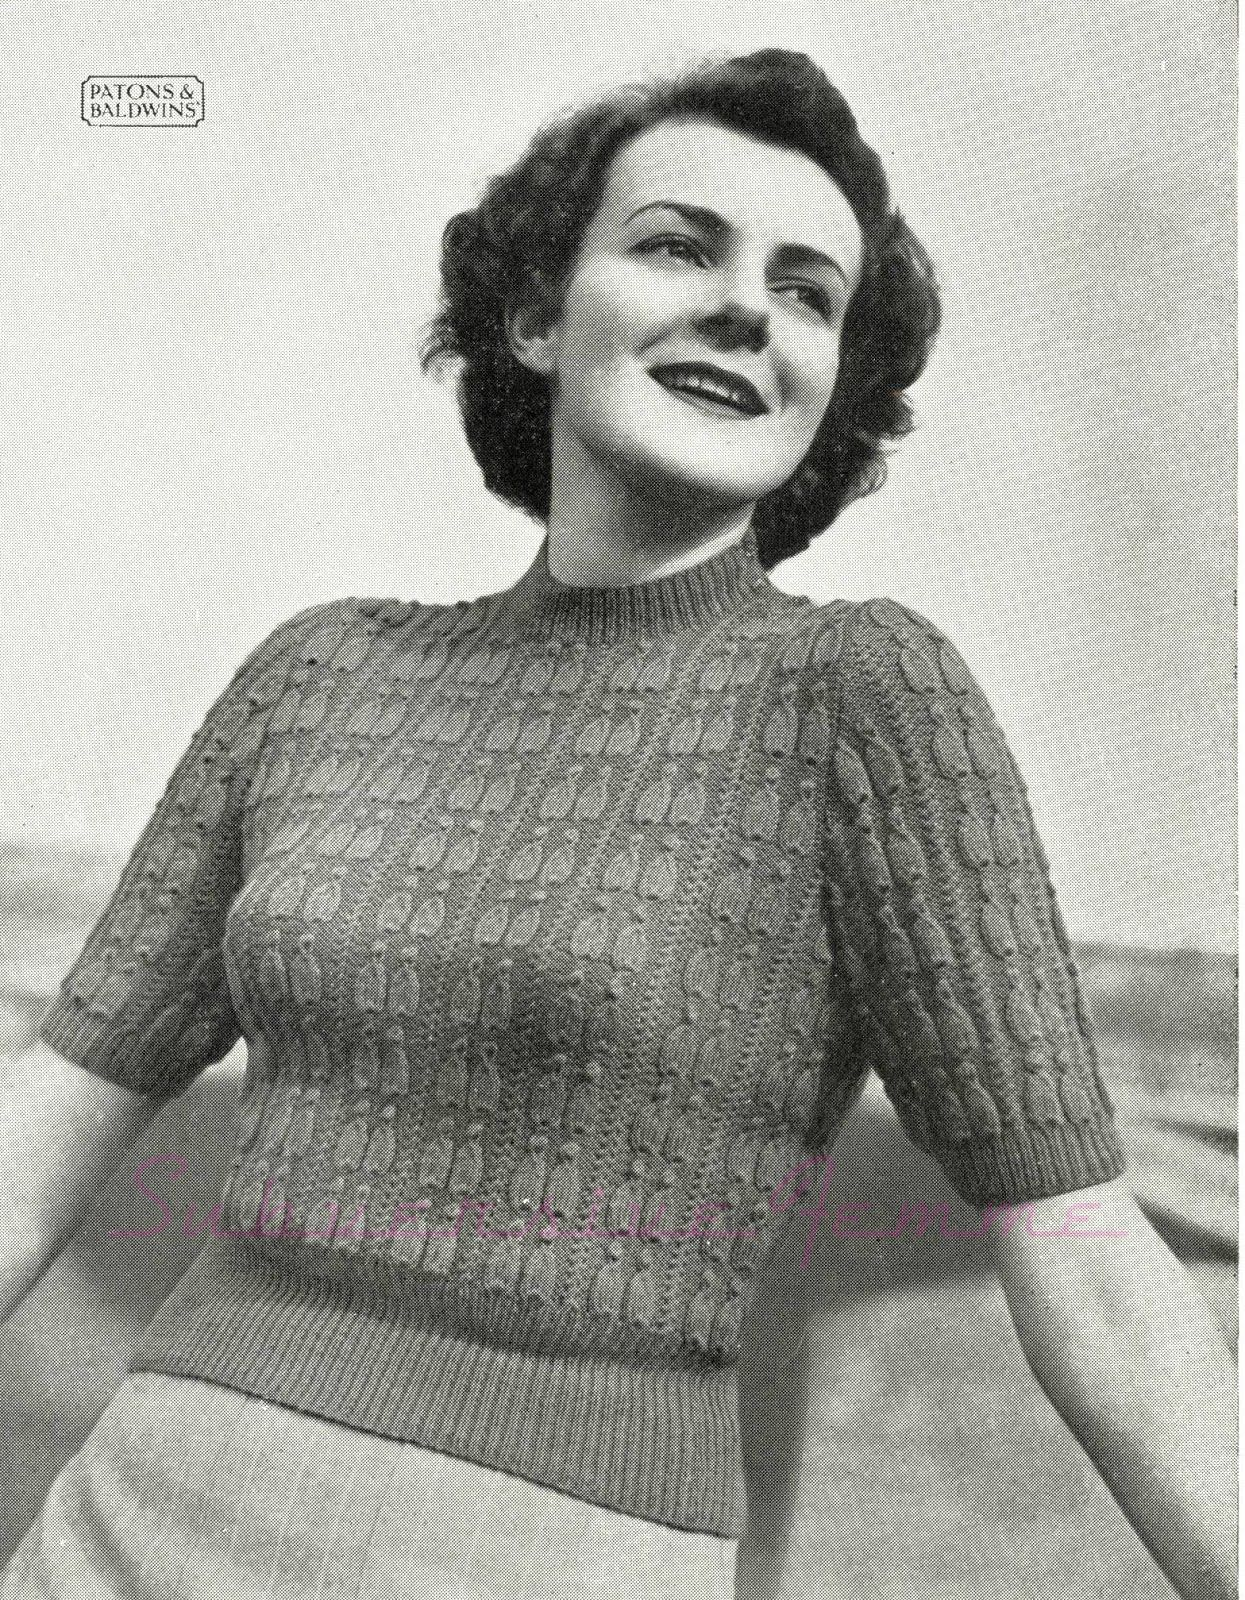 The Vintage Pattern Files: Free 19450\'s Knitting Pattern - Pagliacci ...